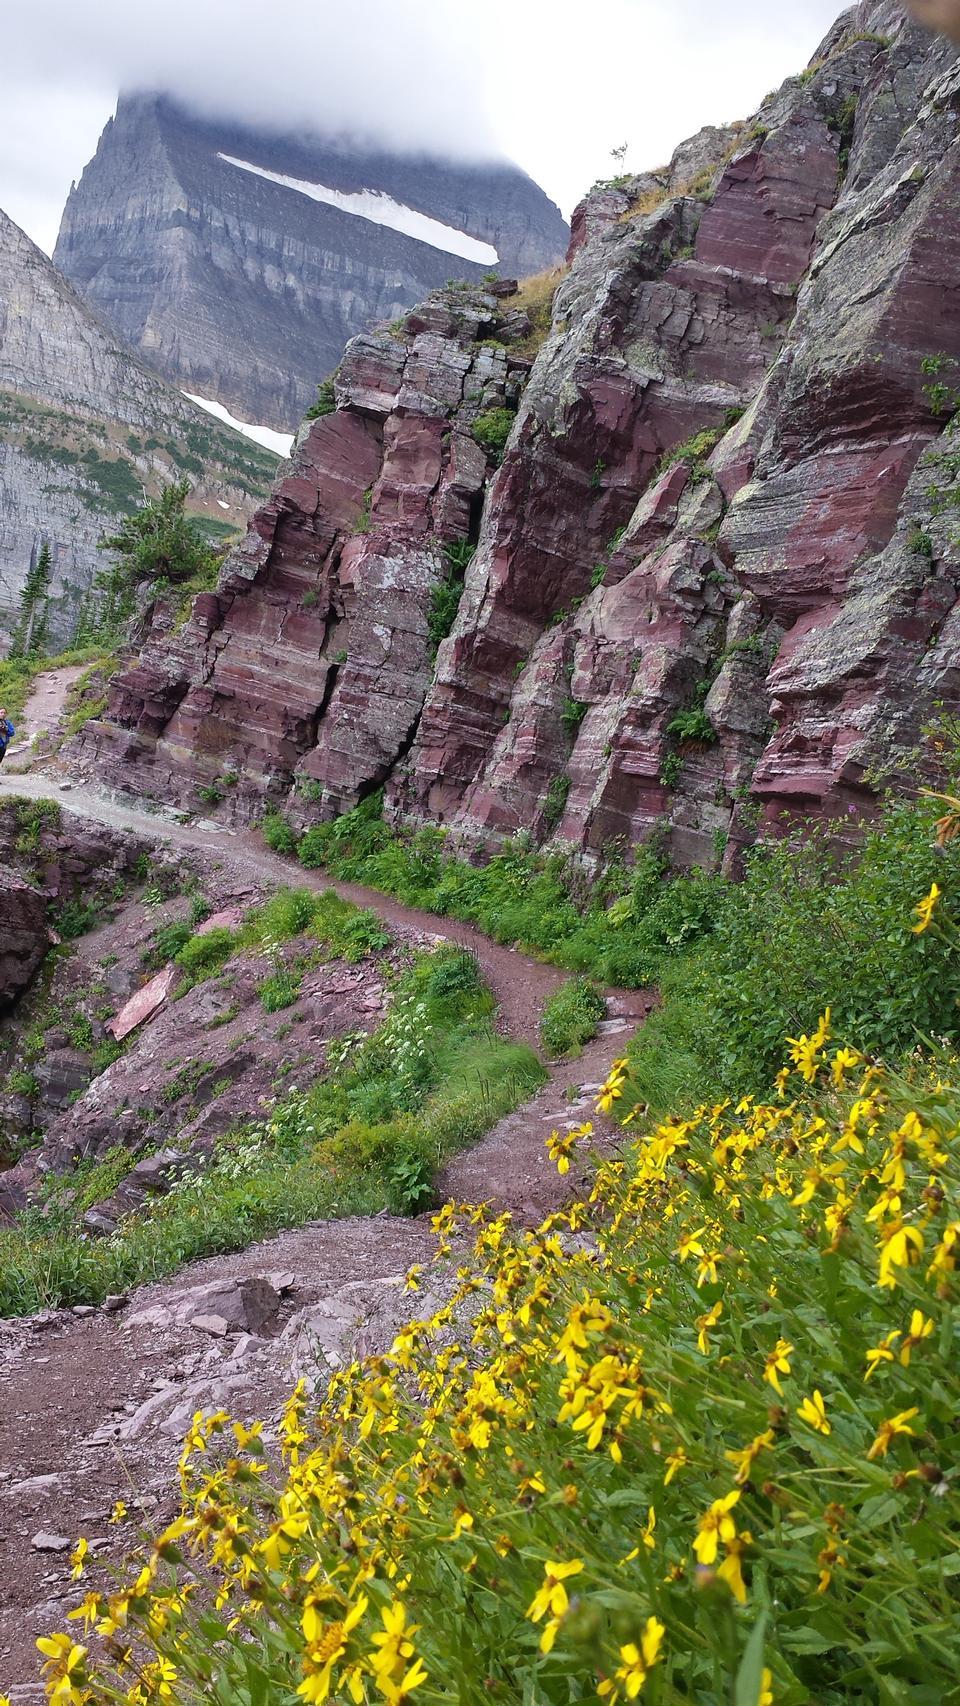 Trail in Glacier National Park, Montana